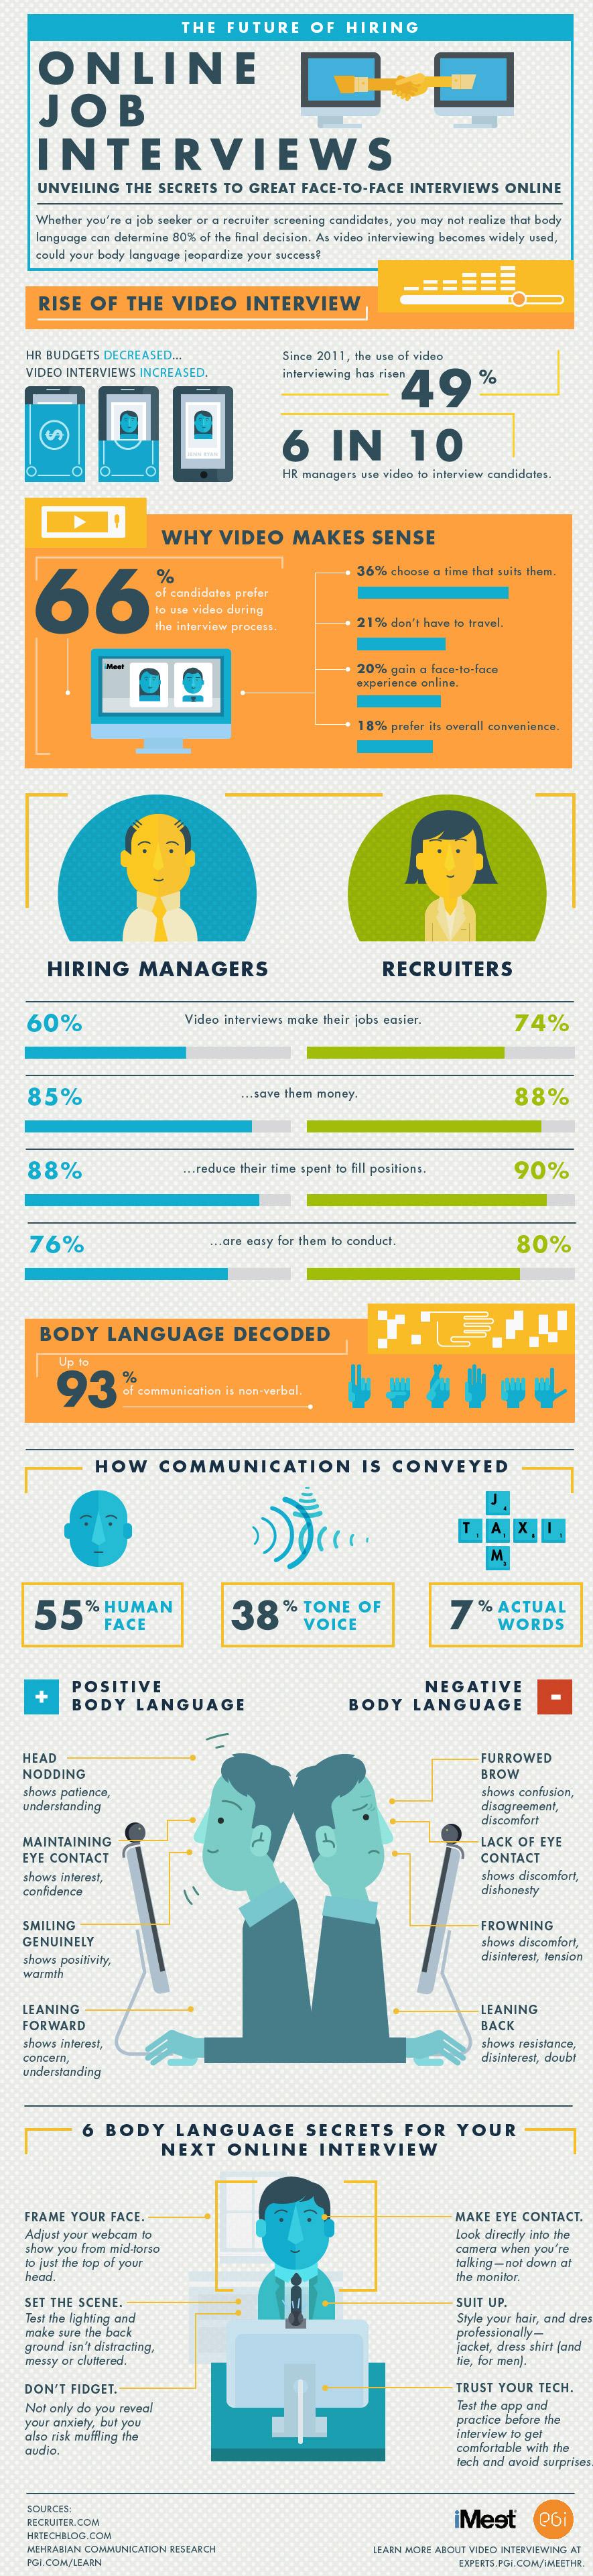 video-chat-job-interviews